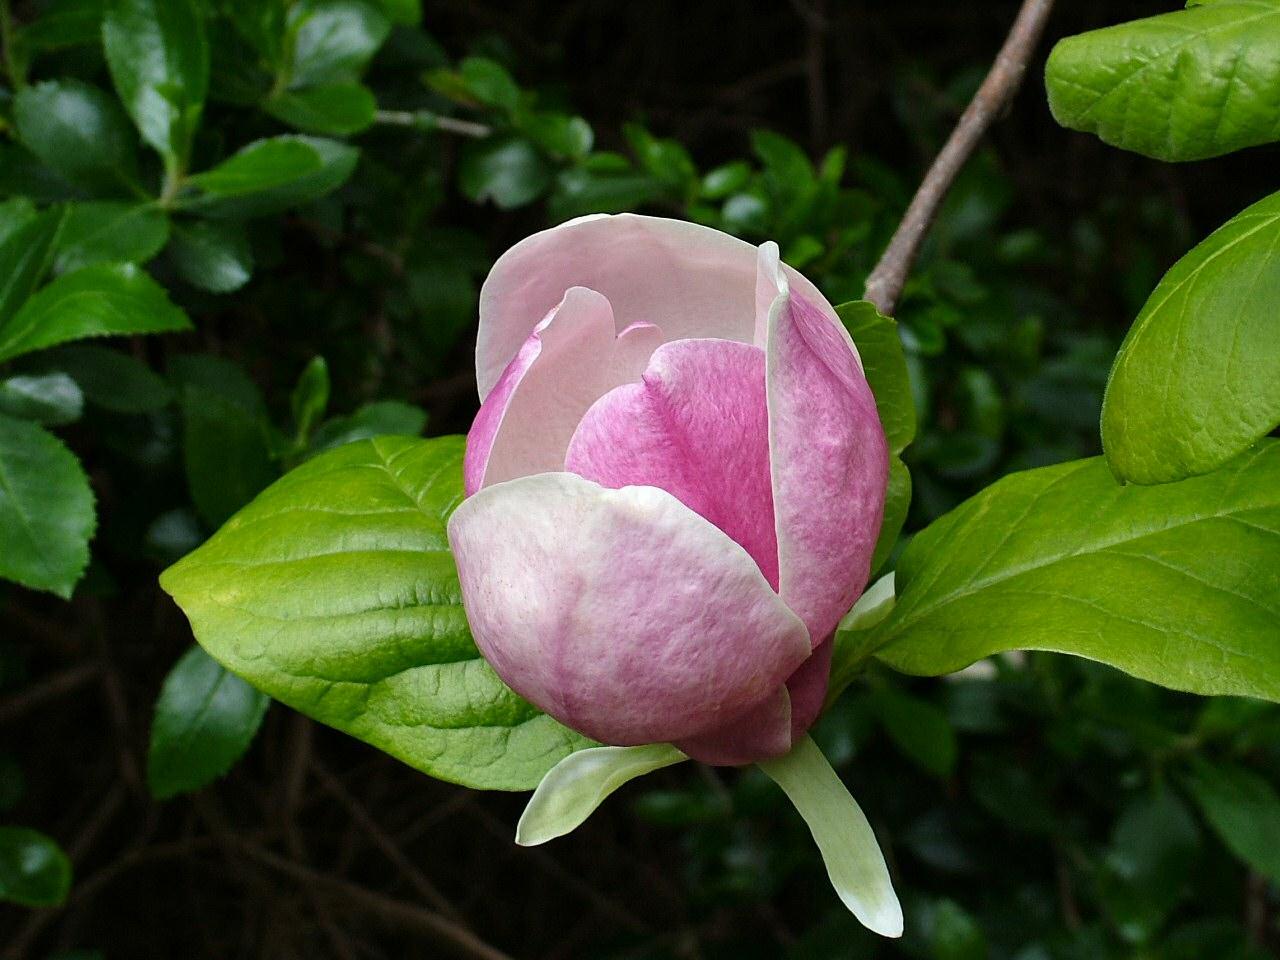 Magnolia_( dicotiledônea)